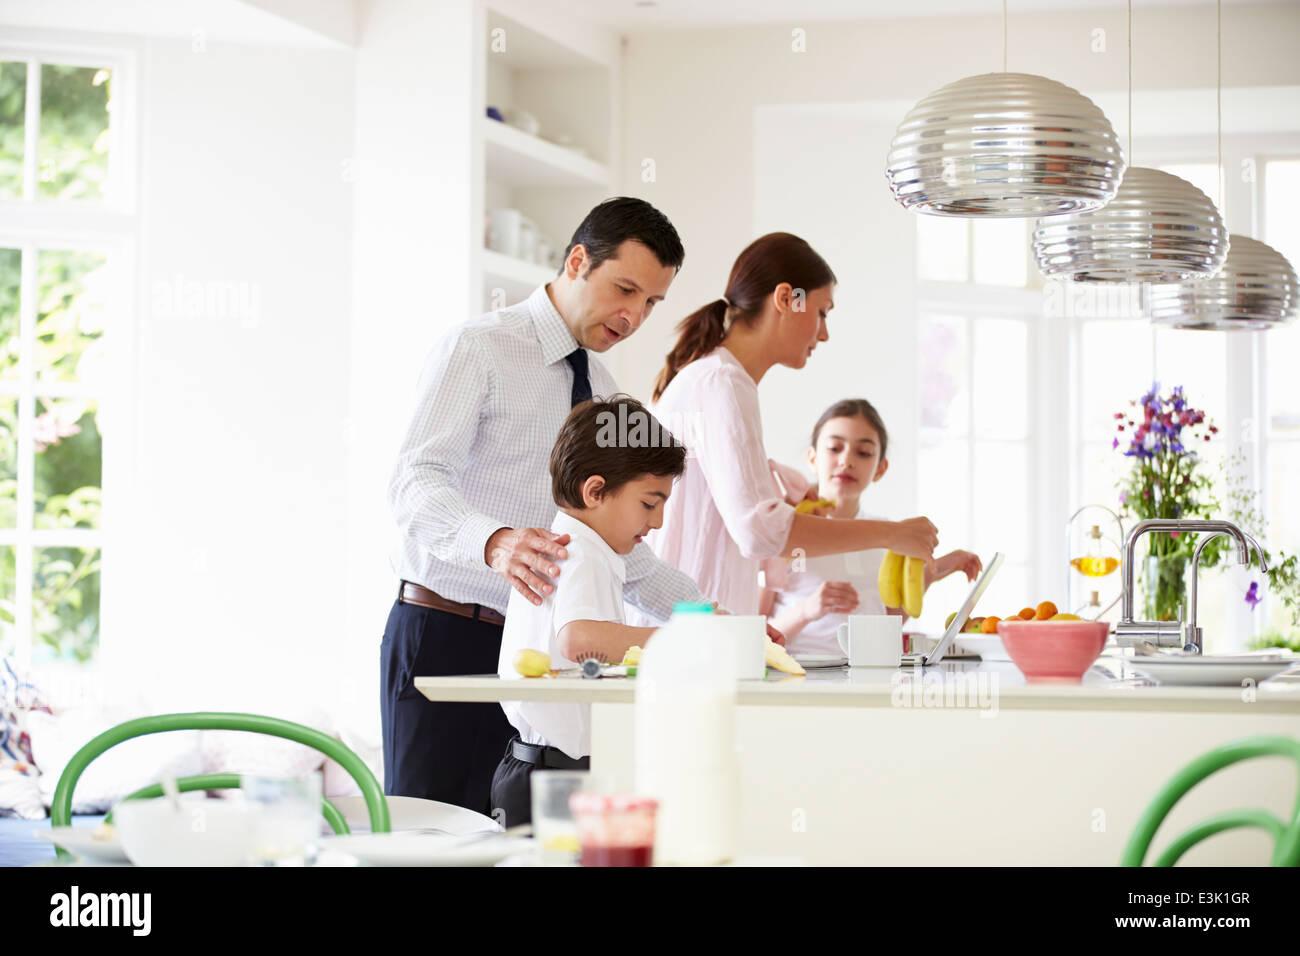 Familie hilft, klare bis nach dem Frühstück Stockbild